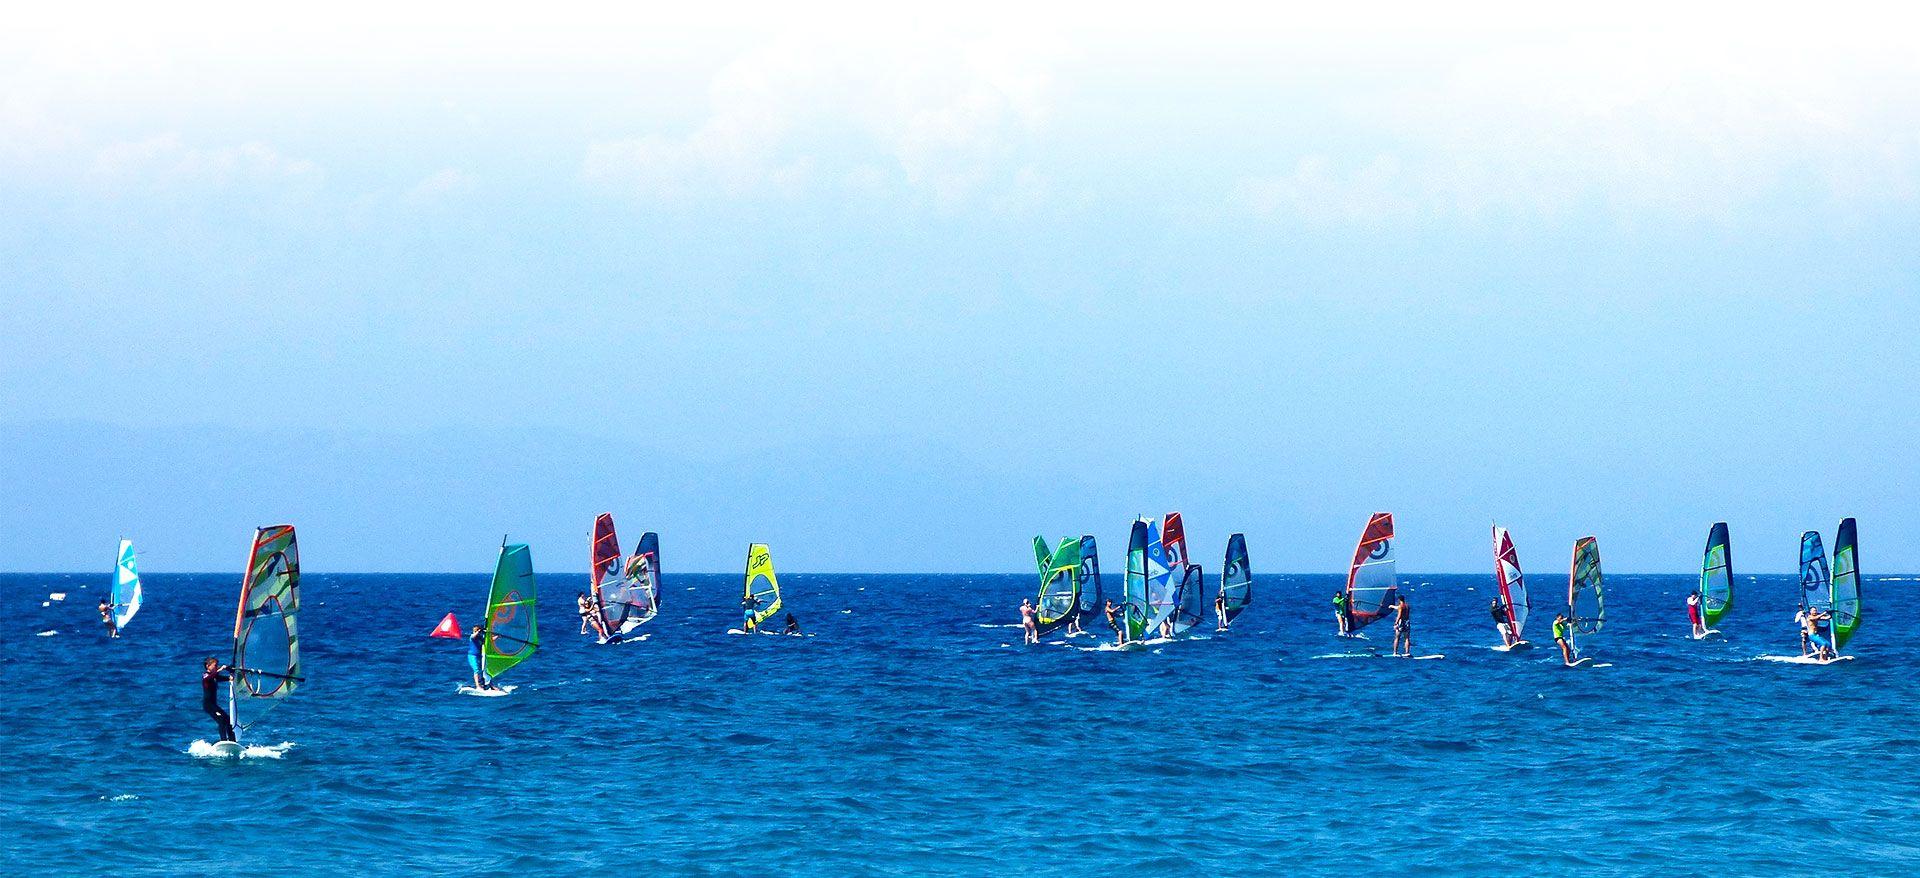 homephoto-surfers—board-sail-windsurfersworld-windsurfing-ixia